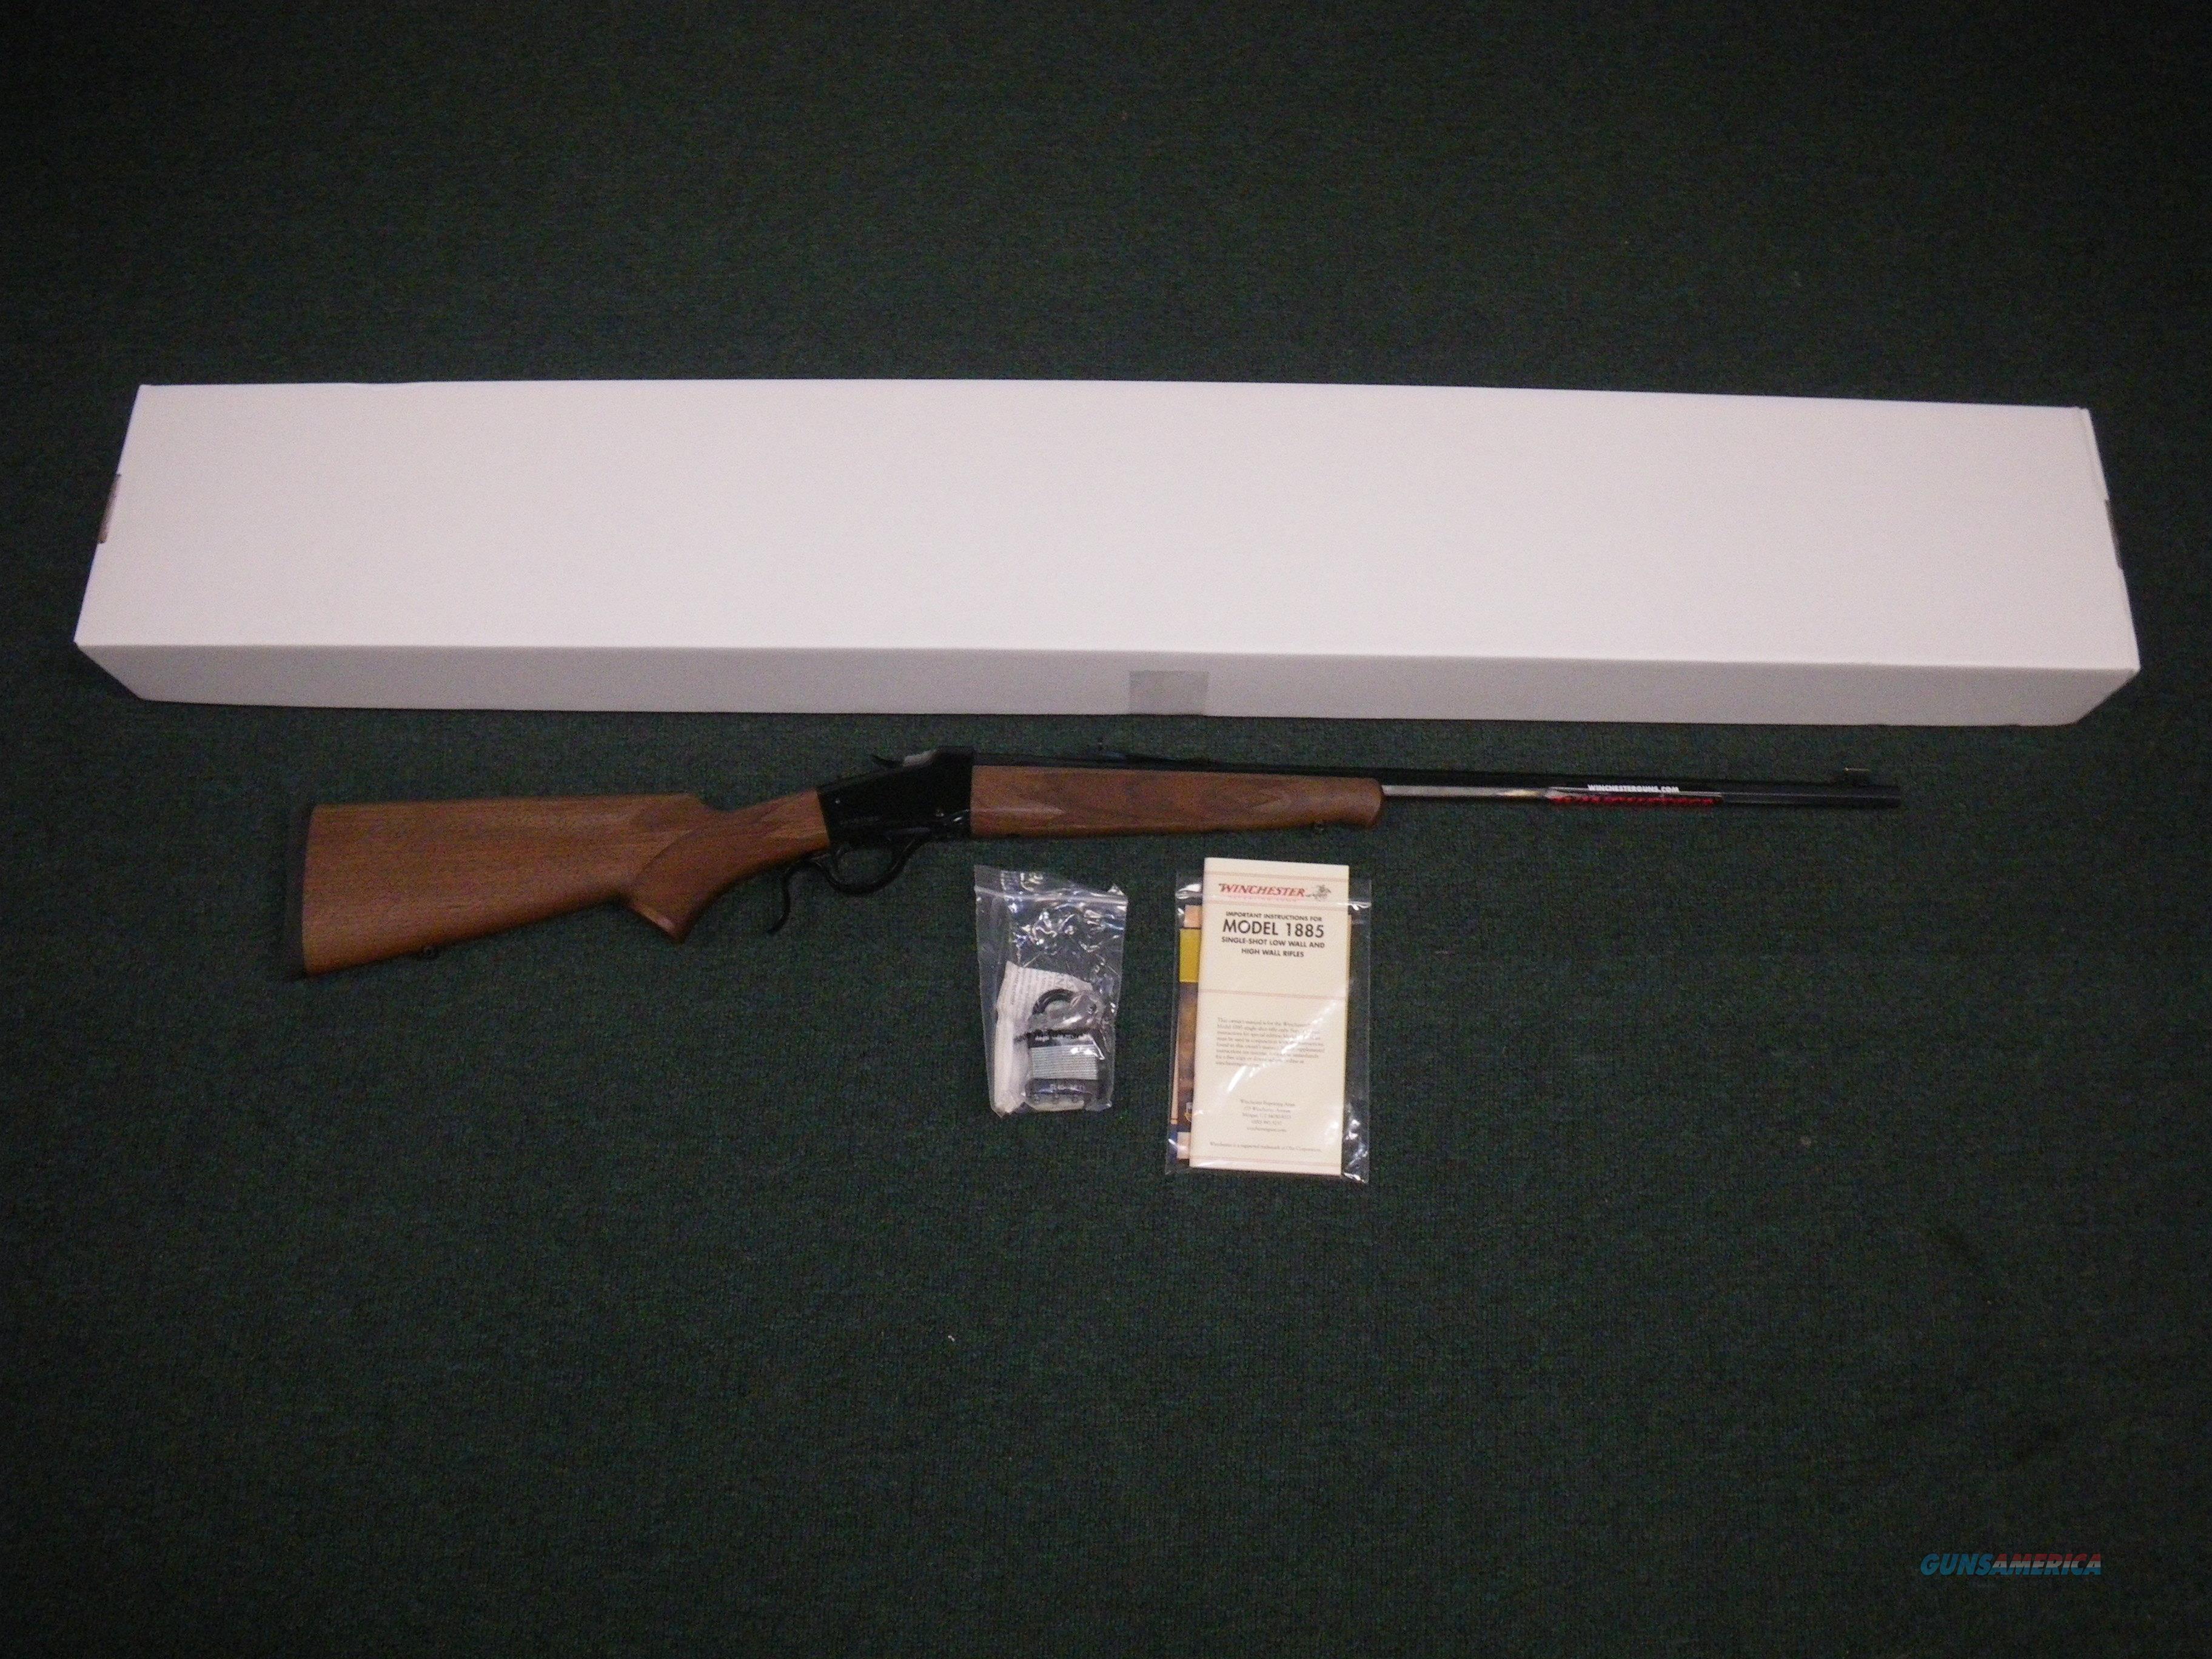 "Winchester Model 1885 Lo-Wall Rimfire 22mag 24"" NEW #524100104  Guns > Rifles > Winchester Rifles - Modern Bolt/Auto/Single > Single Shot"